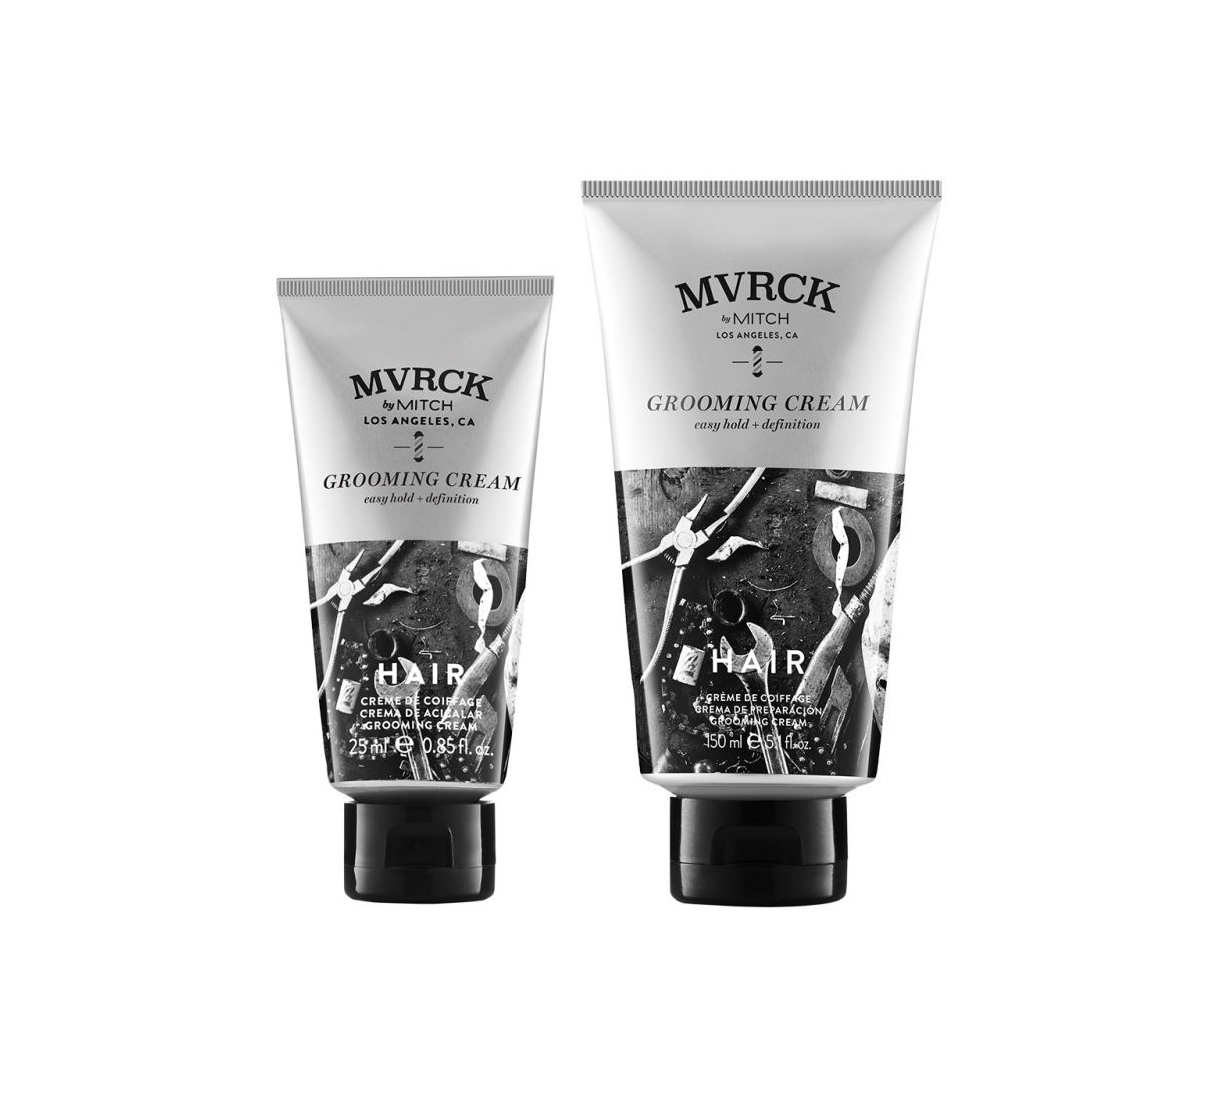 Paul Mitchell MVRCK Grooming Cream - stylingový krém na vlasy so slabou fixáciou